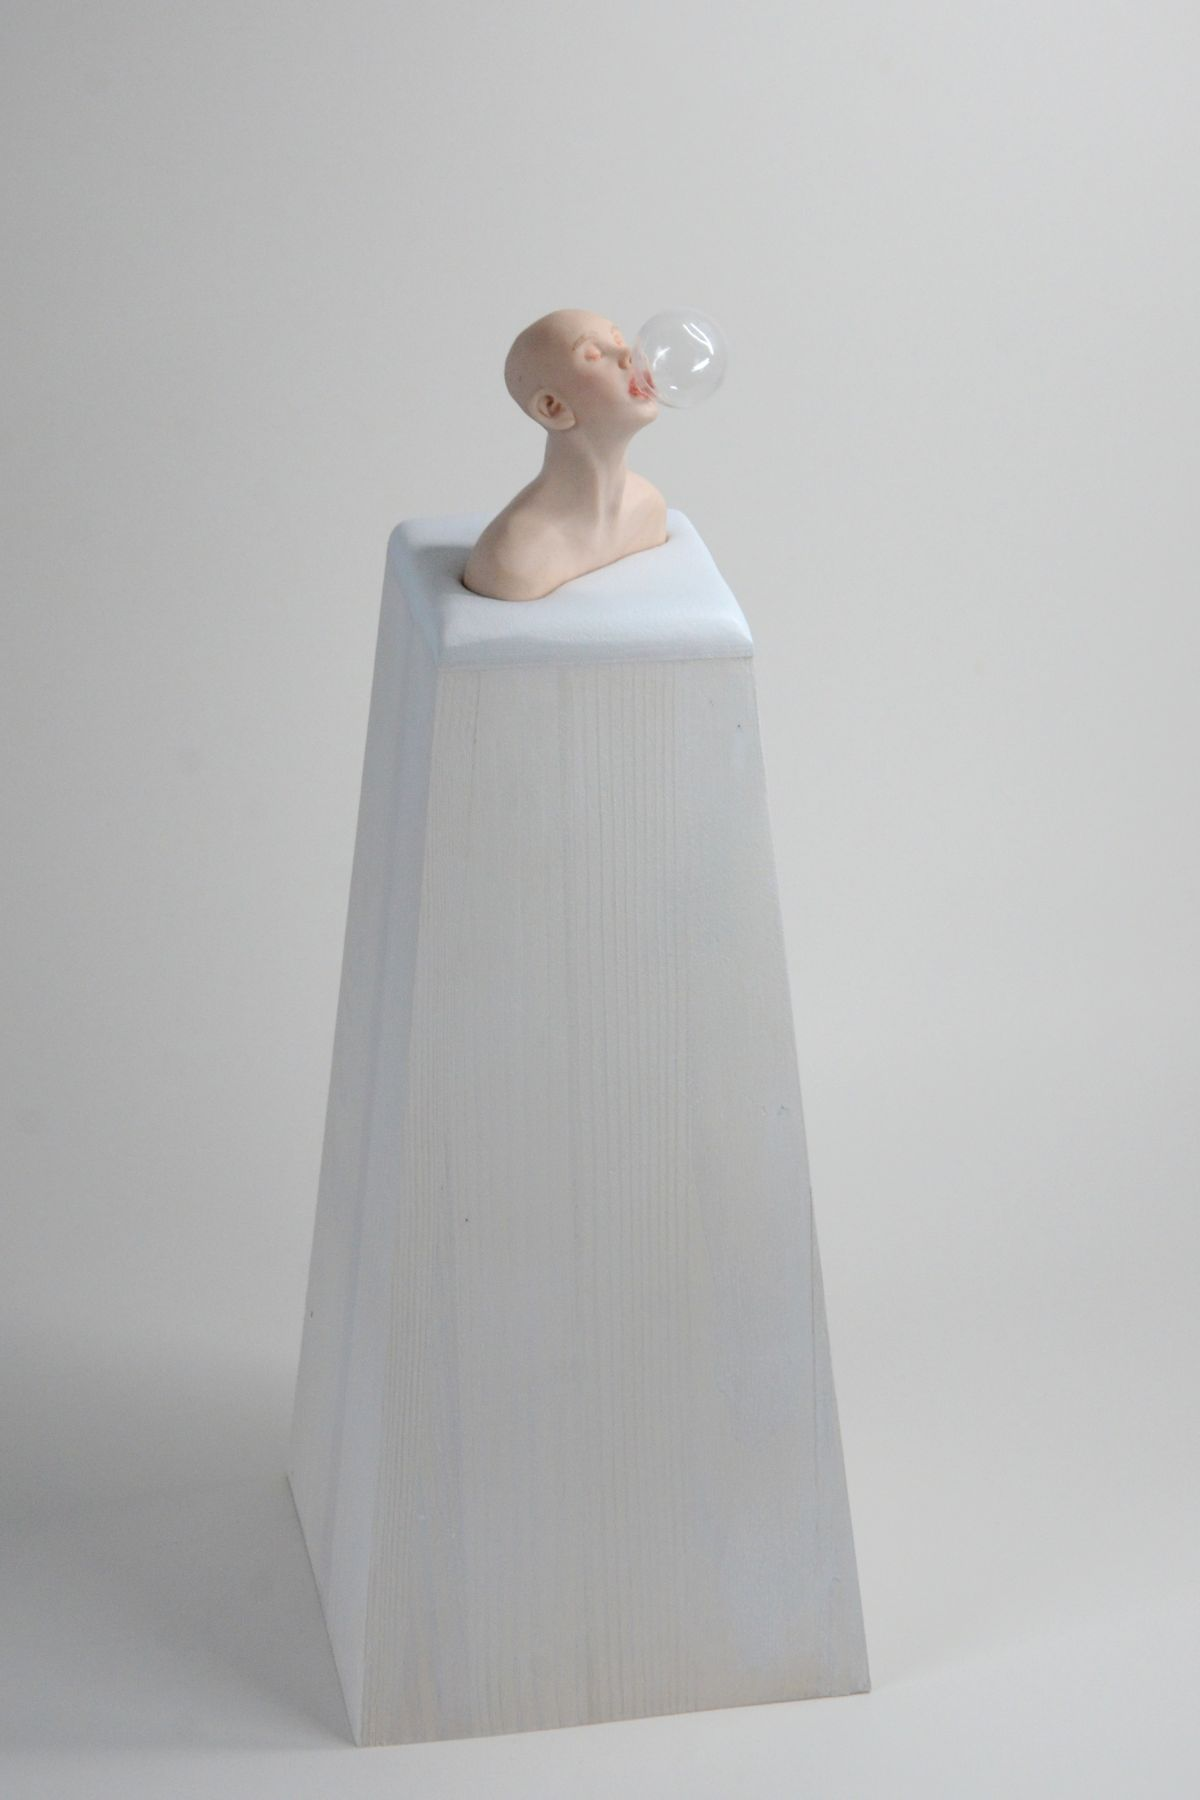 Kunst: Bellenblazer op sokkel van kunstenaar Saskia Hoeboer